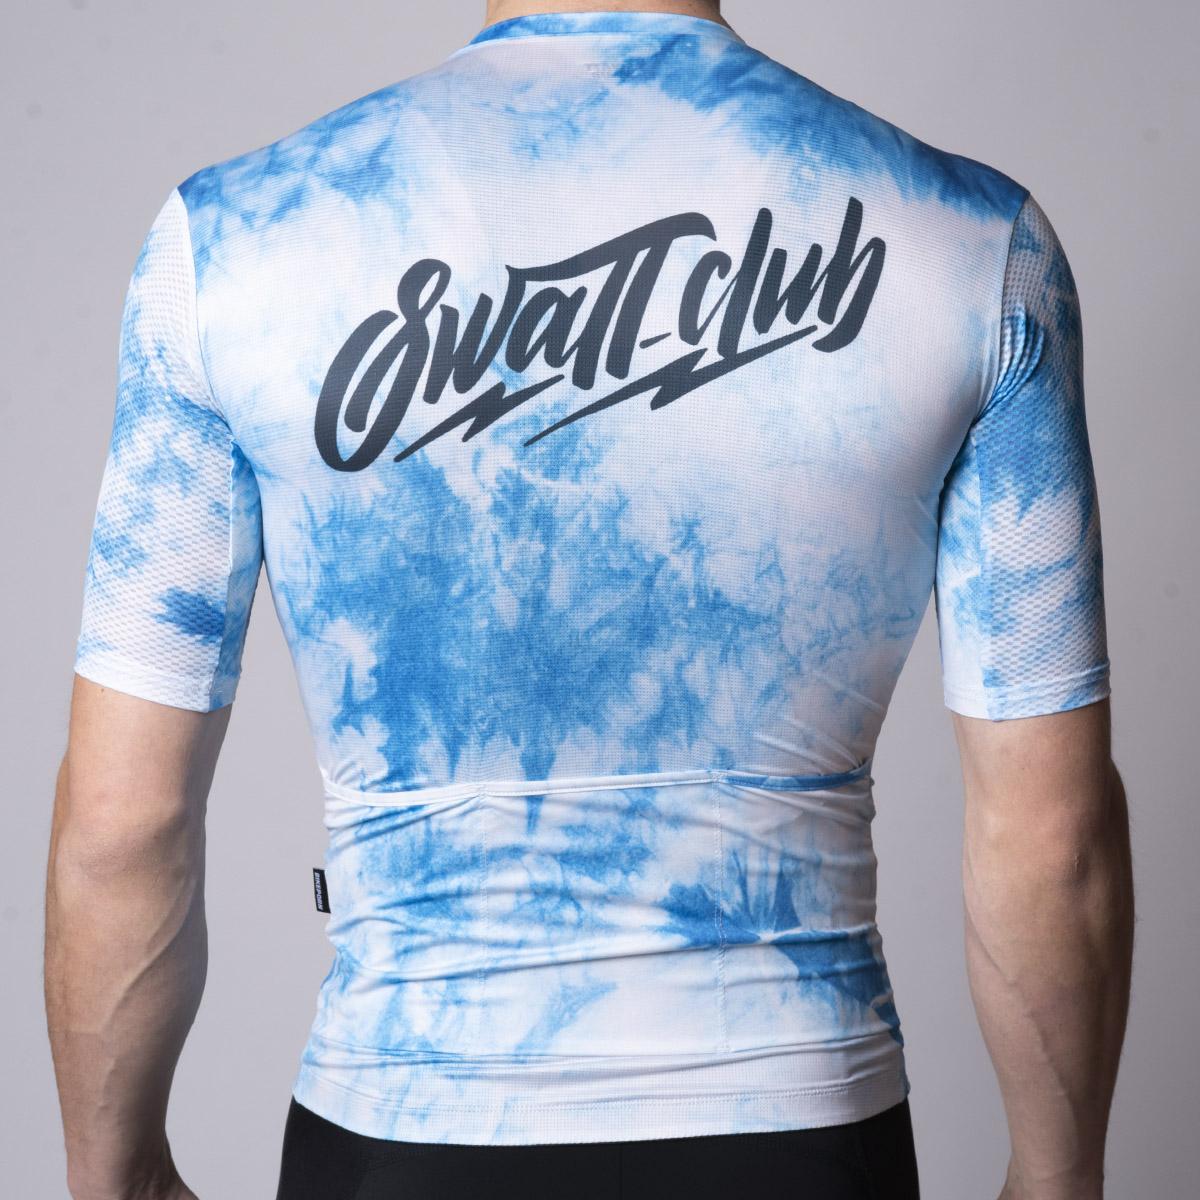 TieDye Cycling Jersey Swatt Club maglia ciclismo